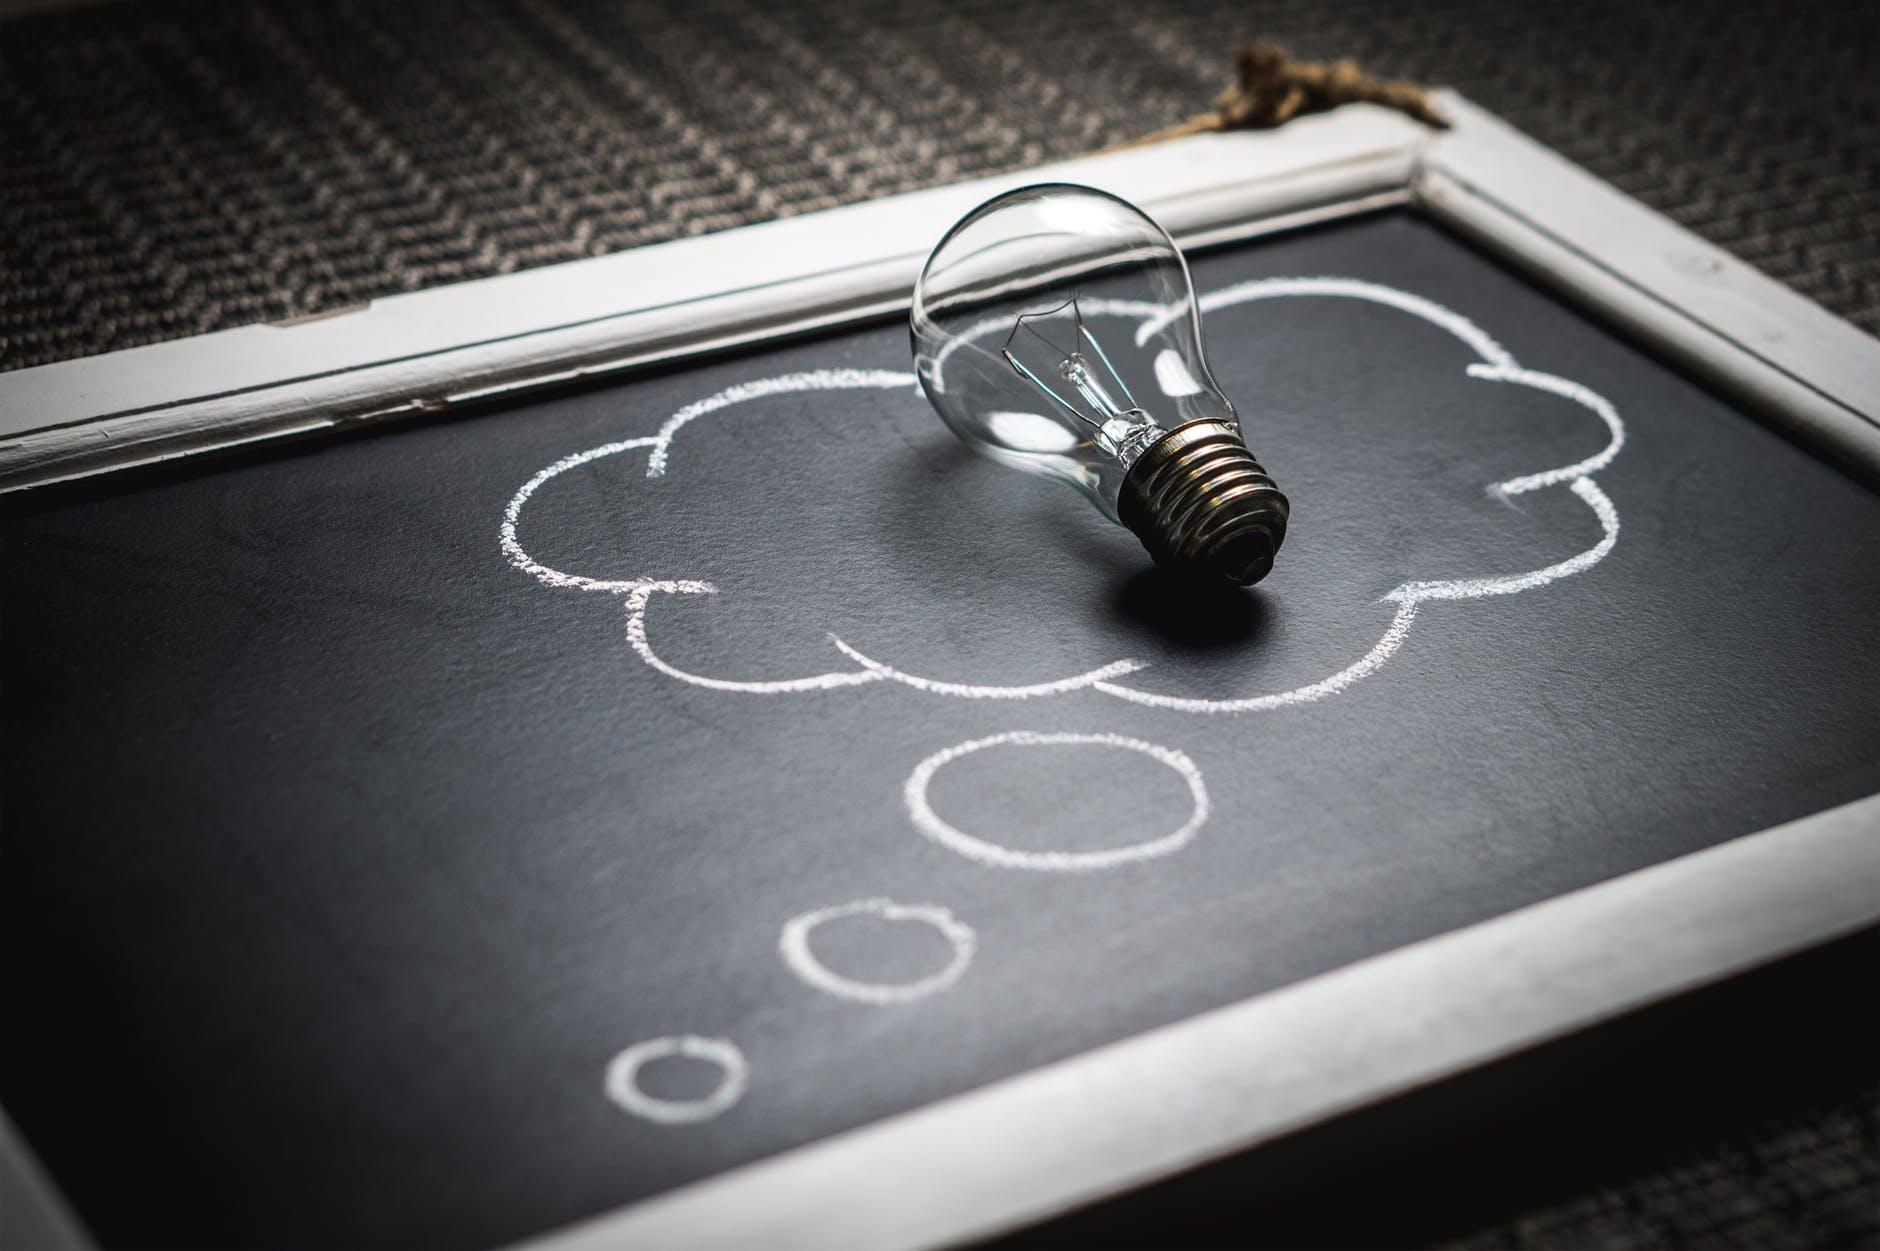 Link for Ideas, ideas trading platform